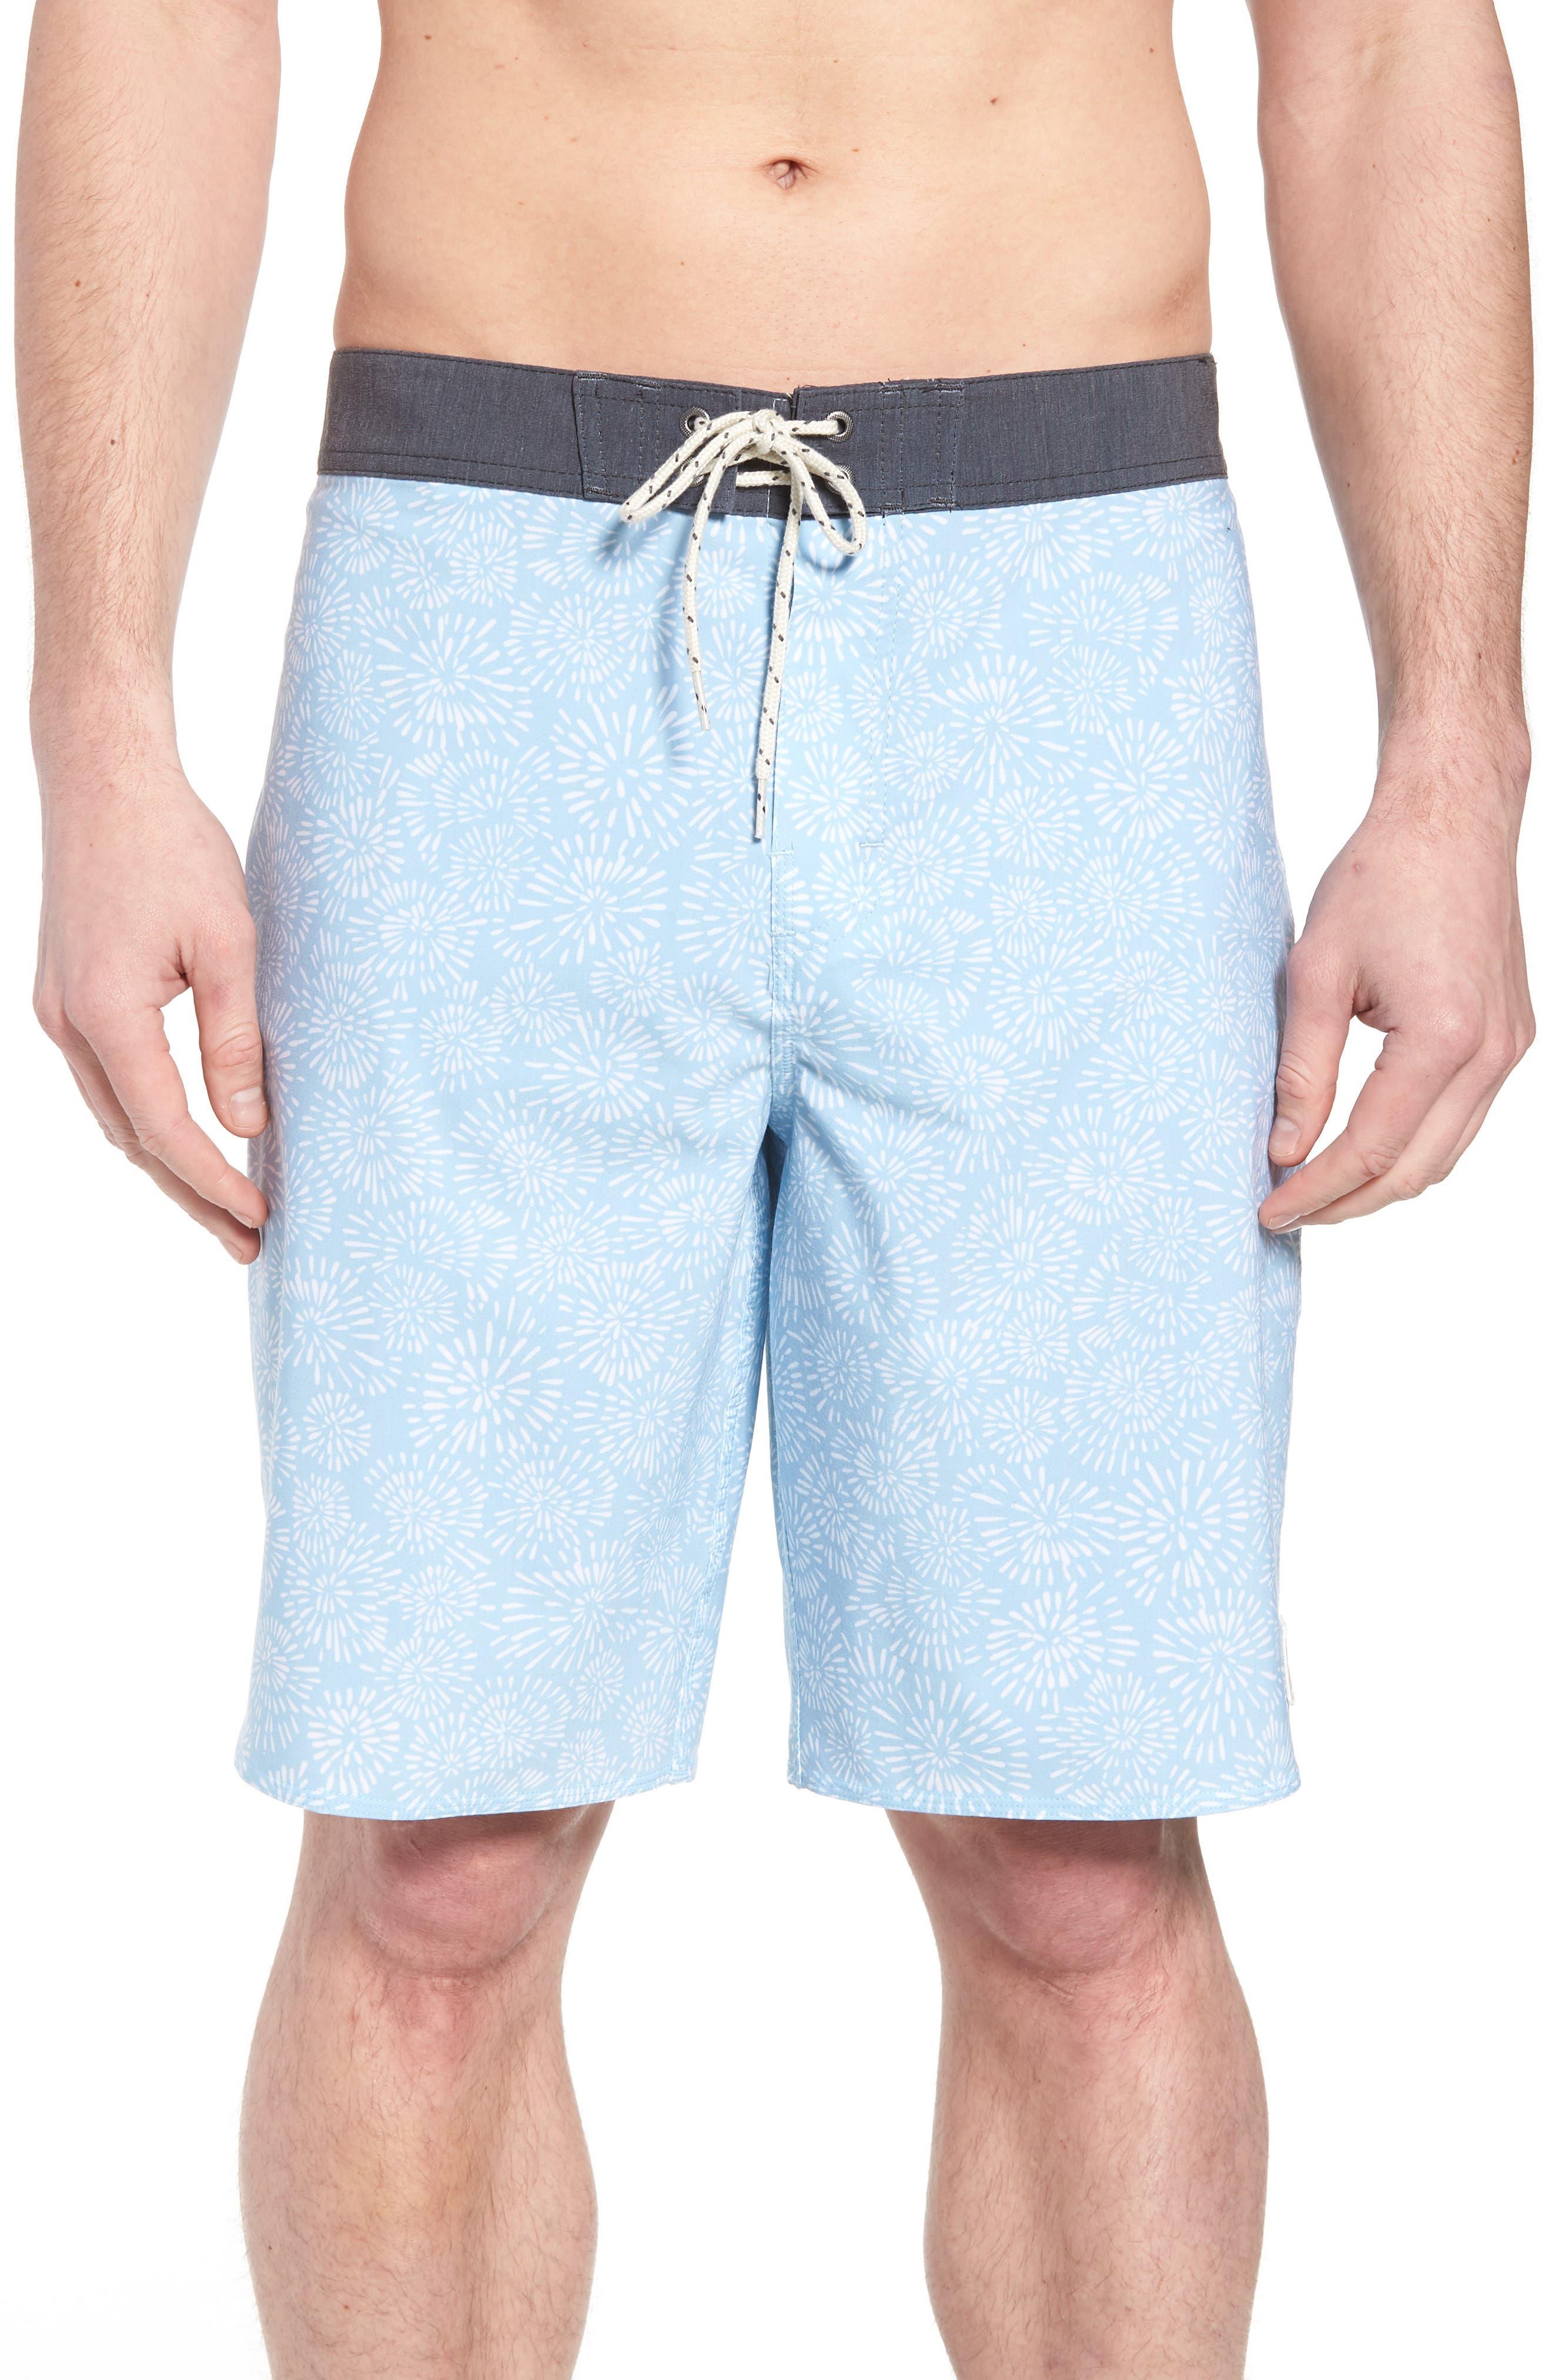 Waterfront Board Shorts,                             Main thumbnail 1, color,                             Light Blue